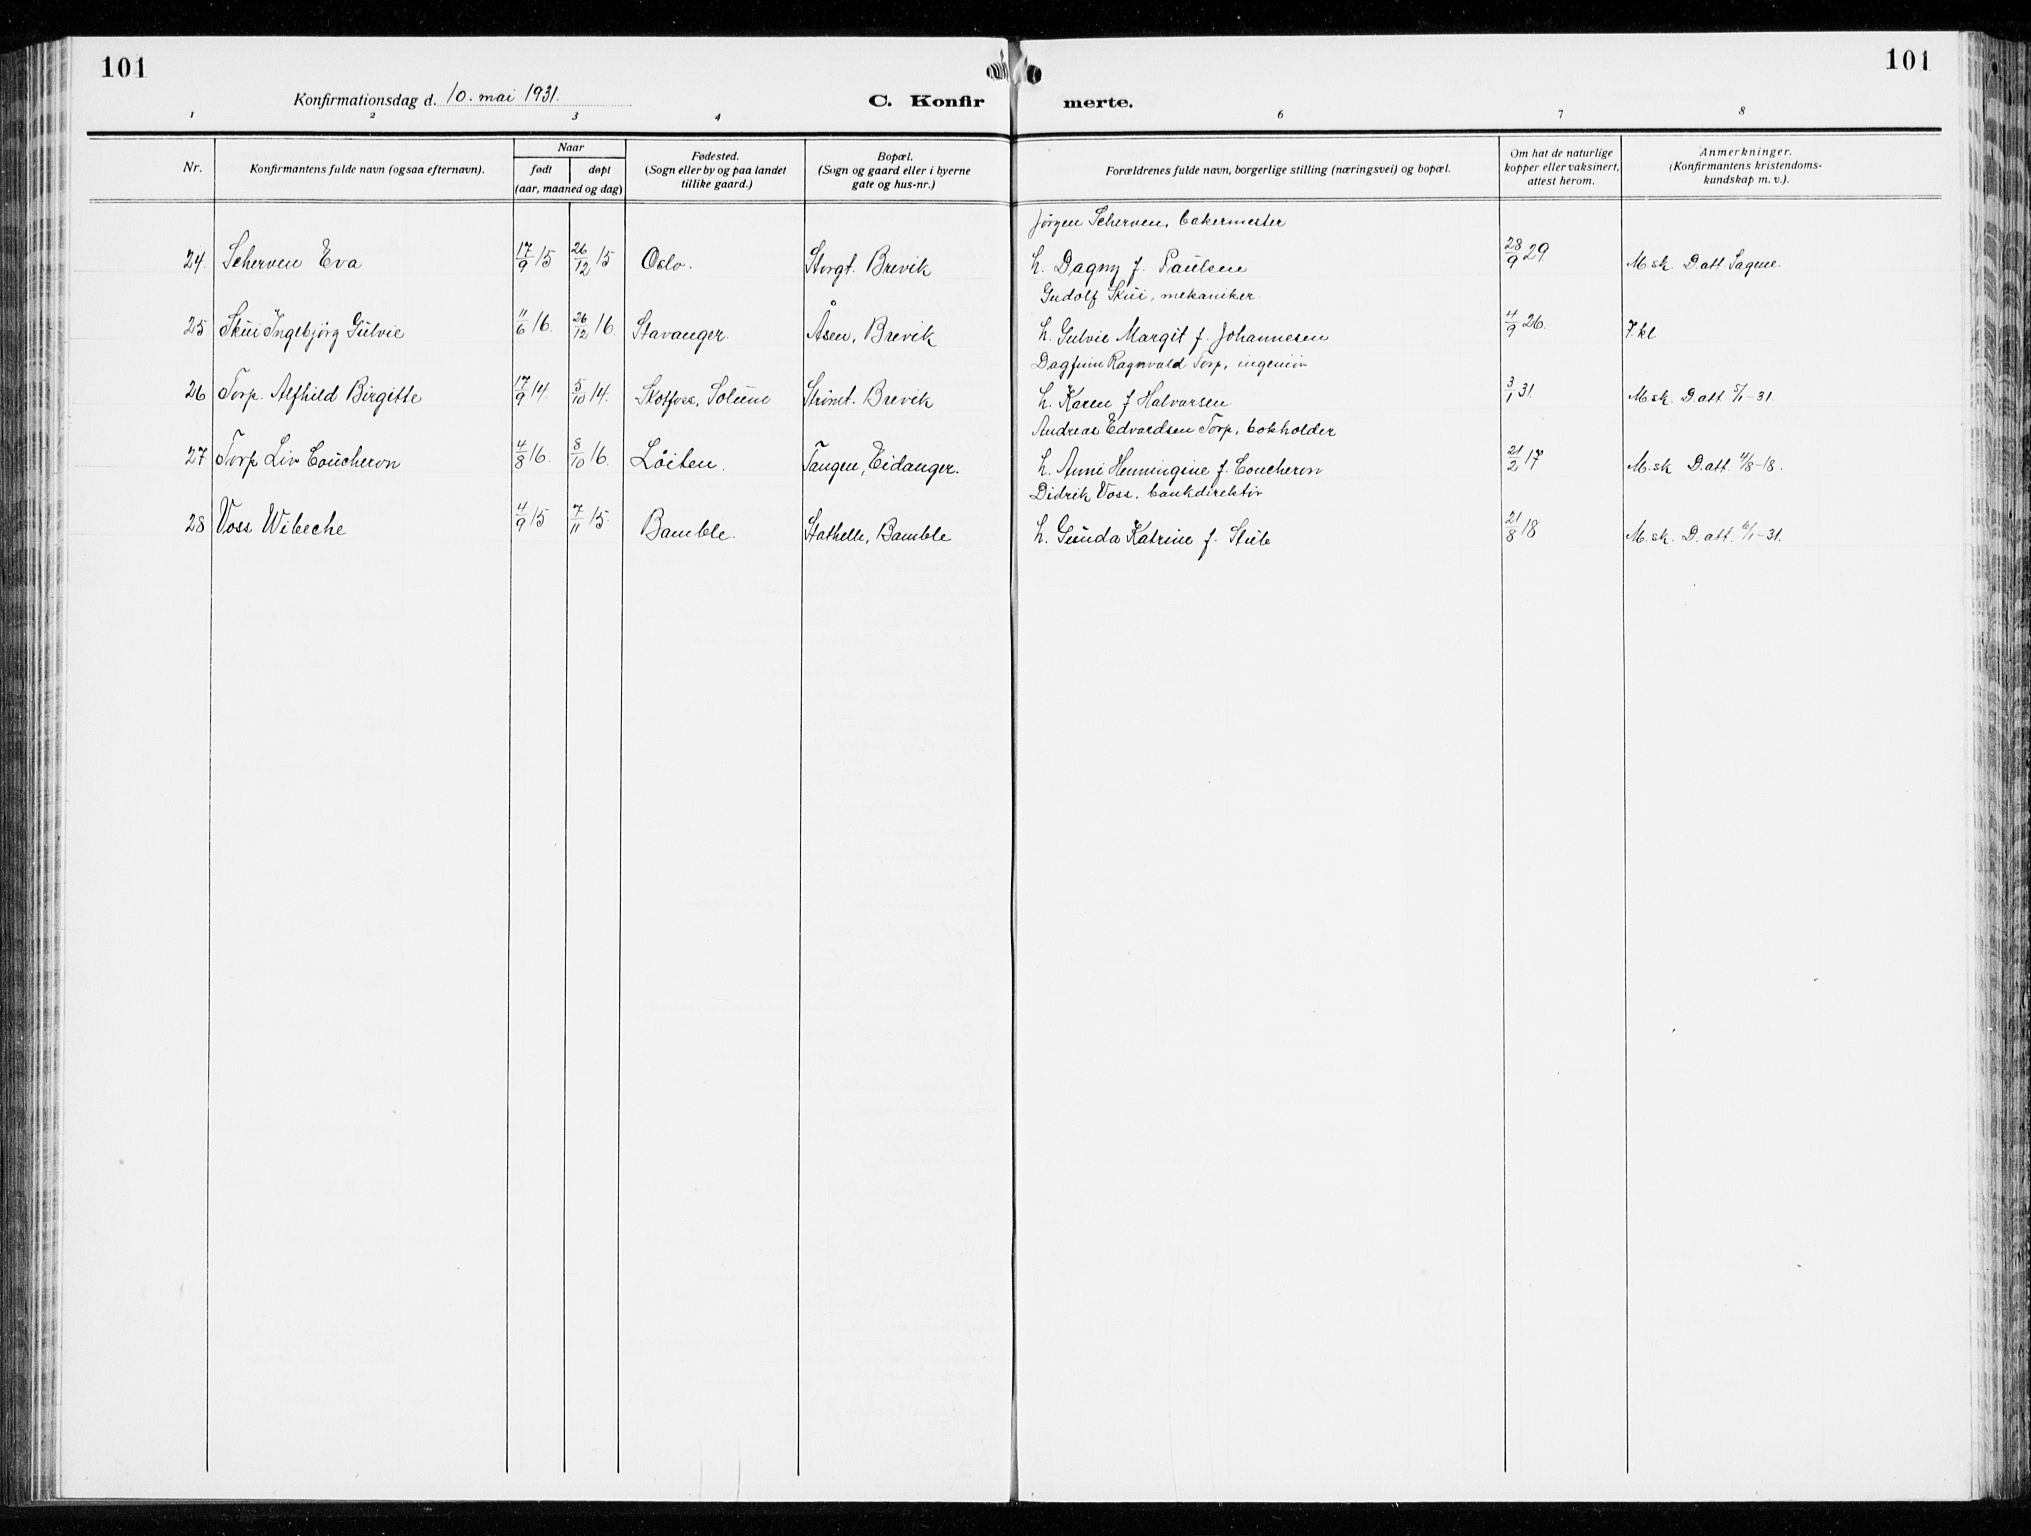 SAKO, Brevik kirkebøker, G/Ga/L0006: Klokkerbok nr. 6, 1922-1940, s. 101